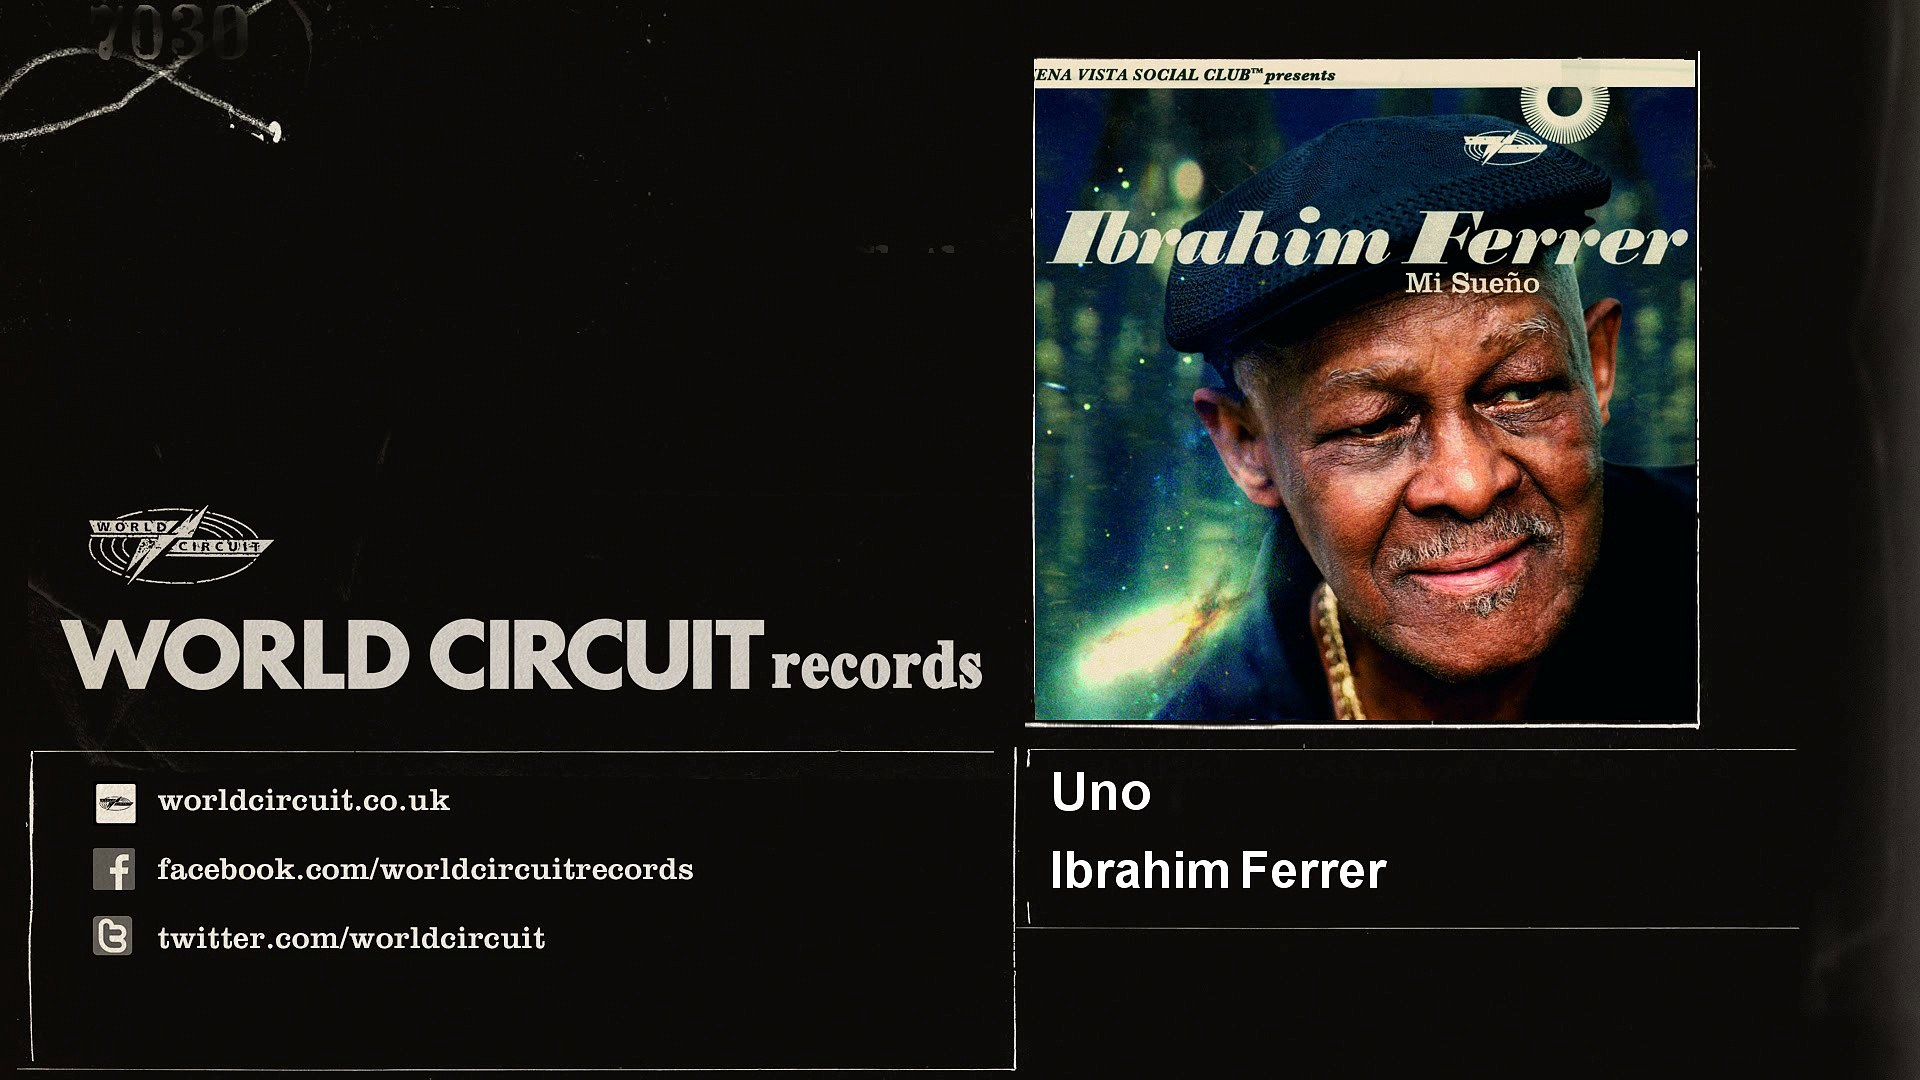 Ibrahim Ferrer - Uno